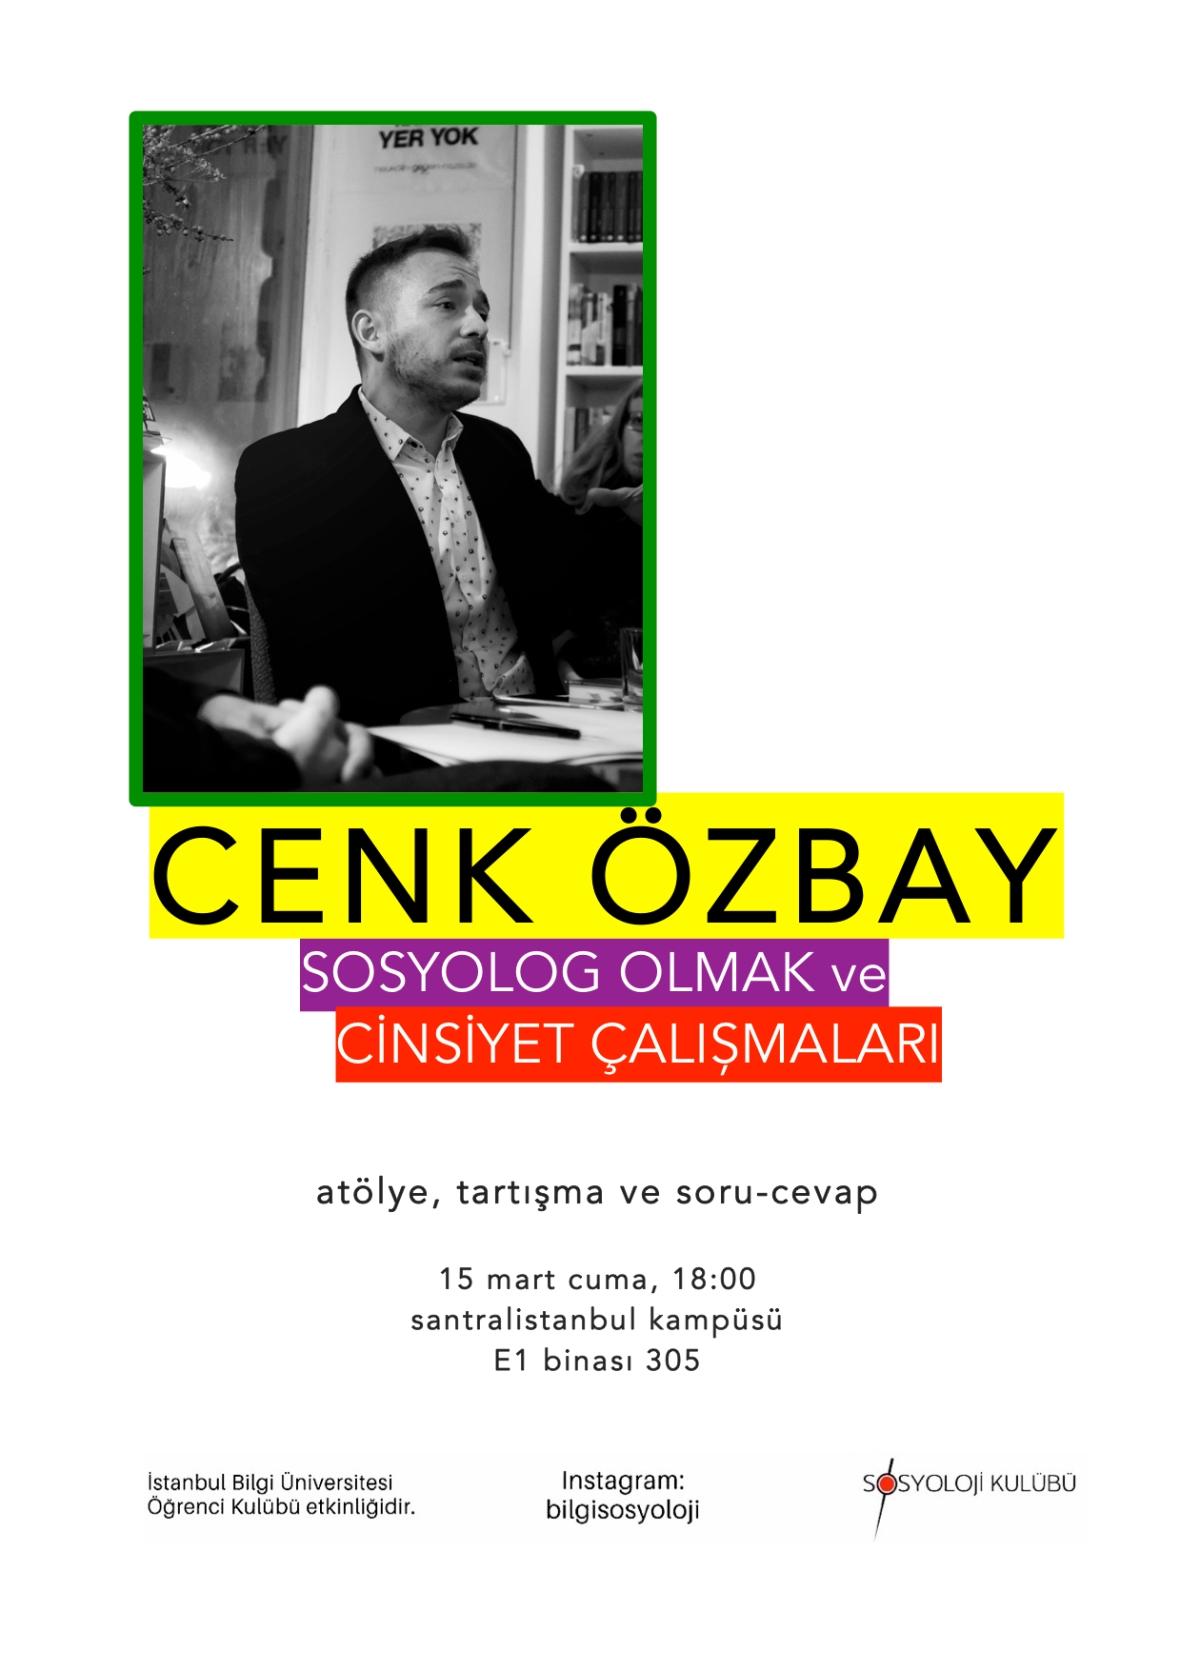 Cenk Ozbay - Bilgi Sosyoloji